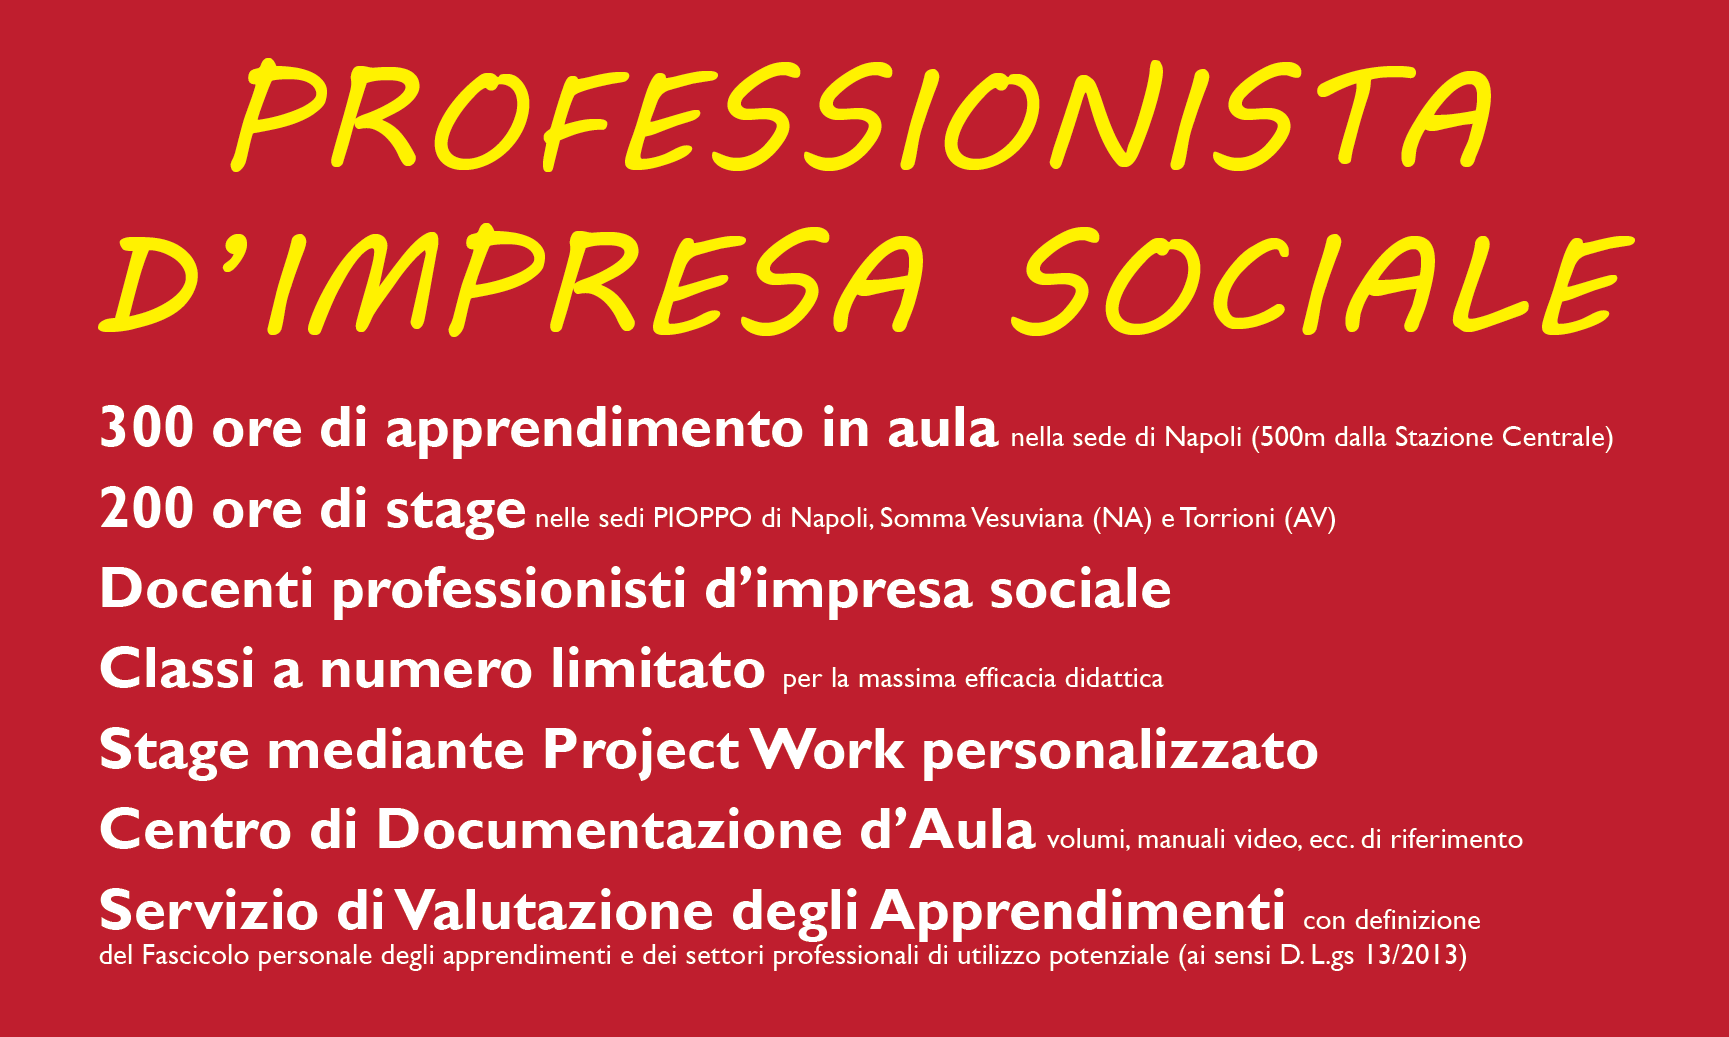 Diventare professionista d'impresa sociale